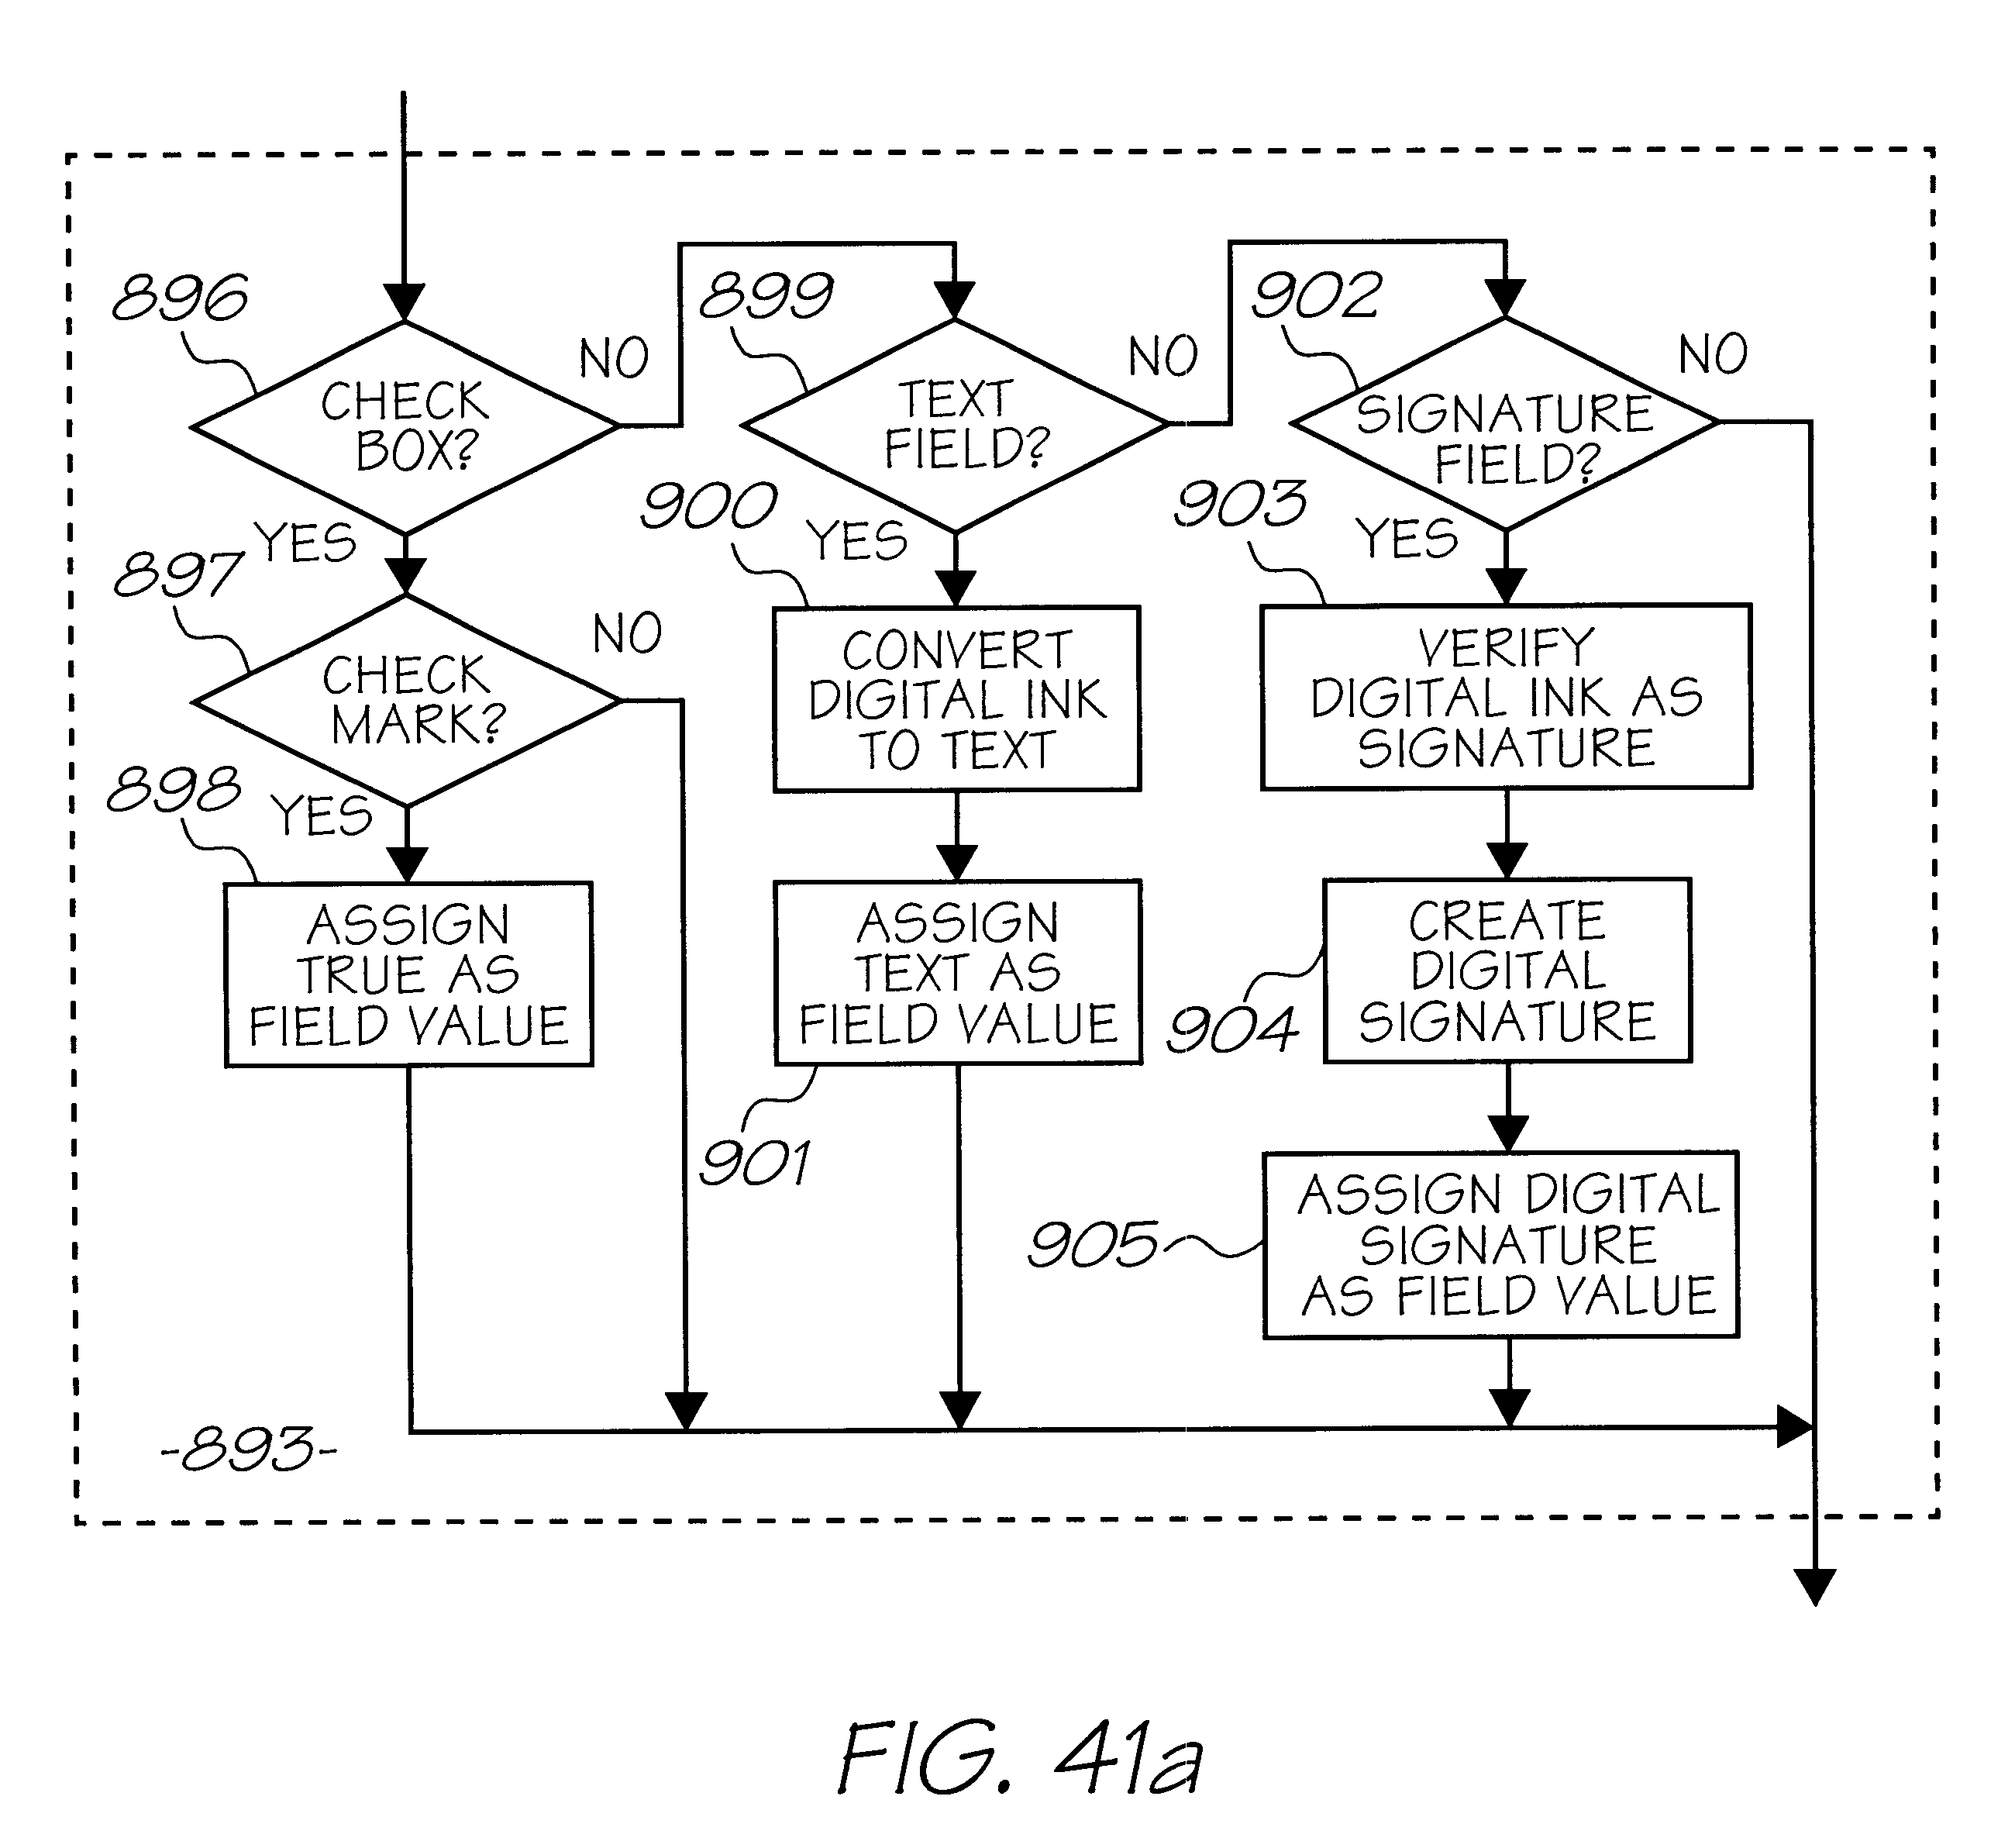 Patent US 6,457,883 B1